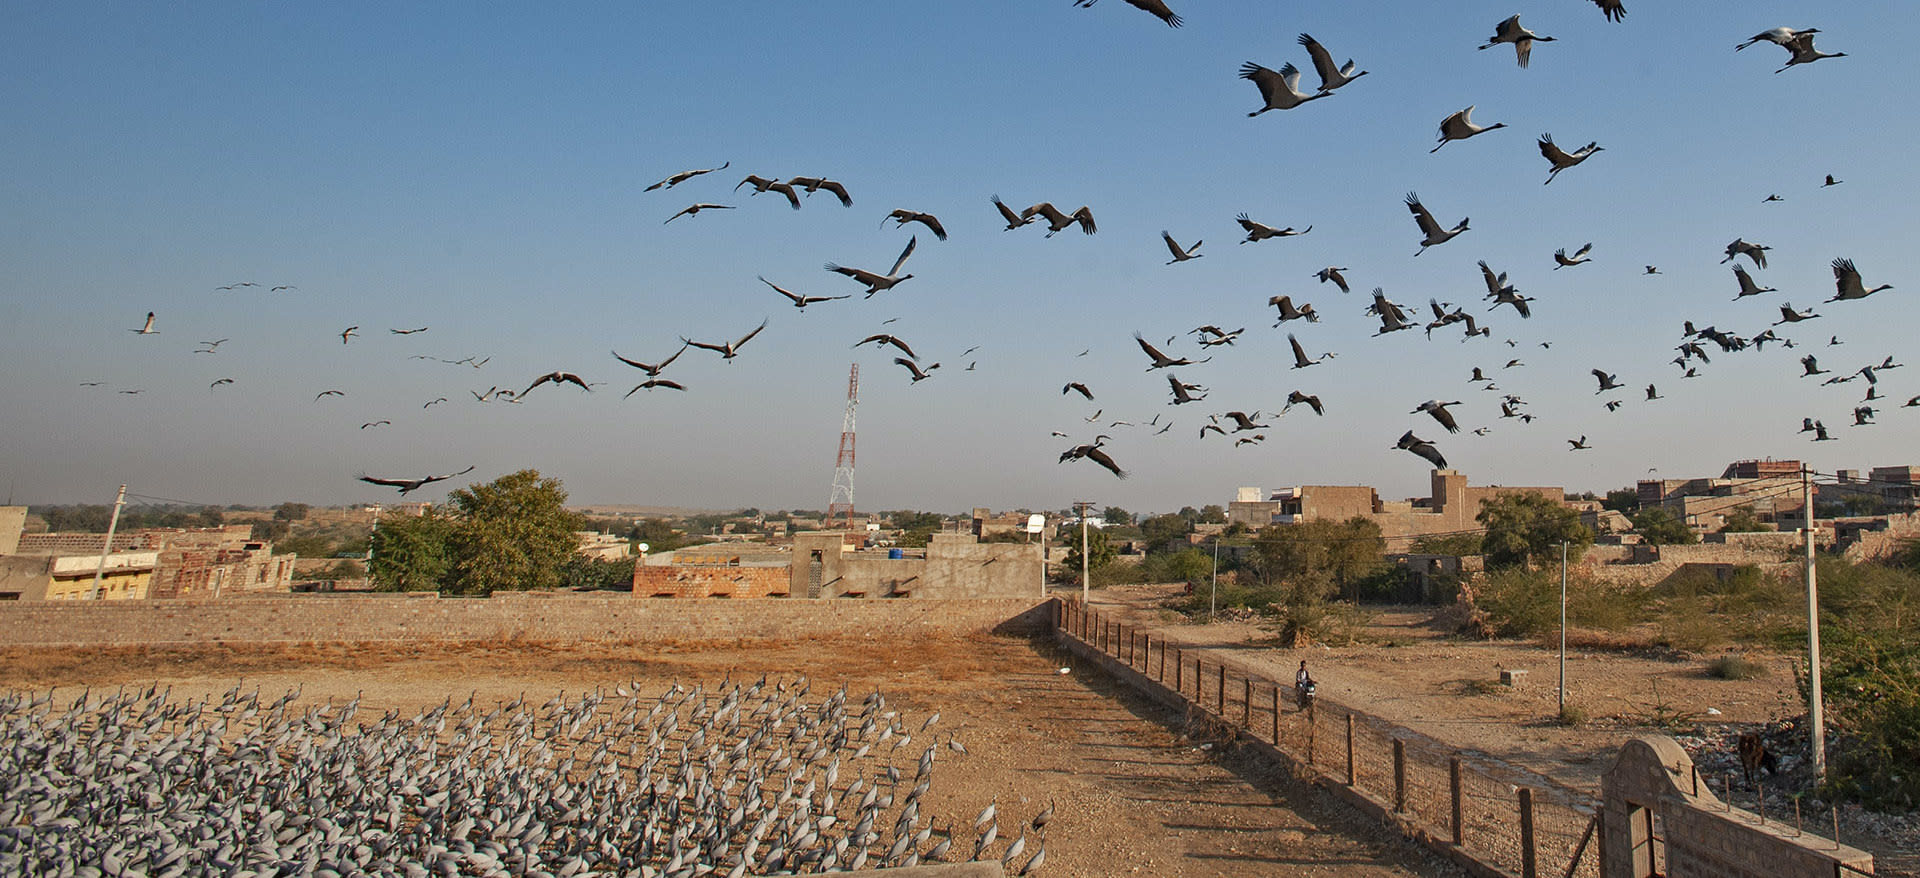 kheechan-demoiselle-crane-flock-flying-feeding-house-flying-away-once-done-with-food